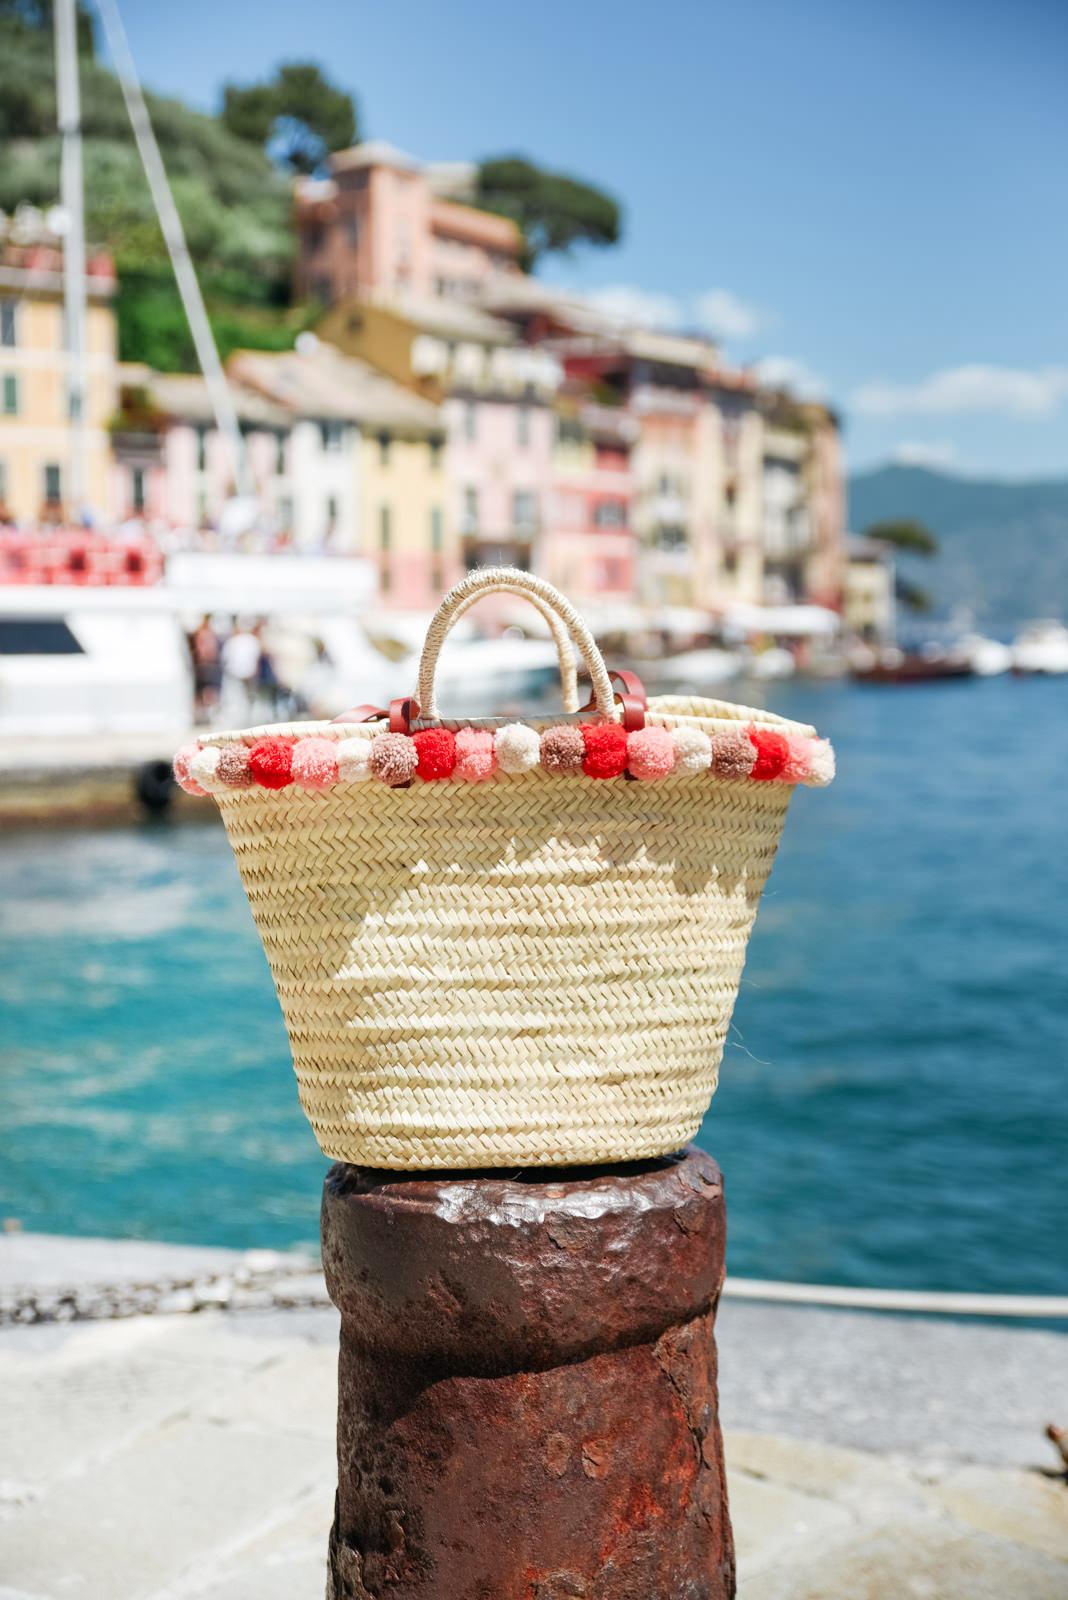 Blog-Mode-And-The-City-Lifestyle-Italie-Portofino-Belmond-Hotel-14